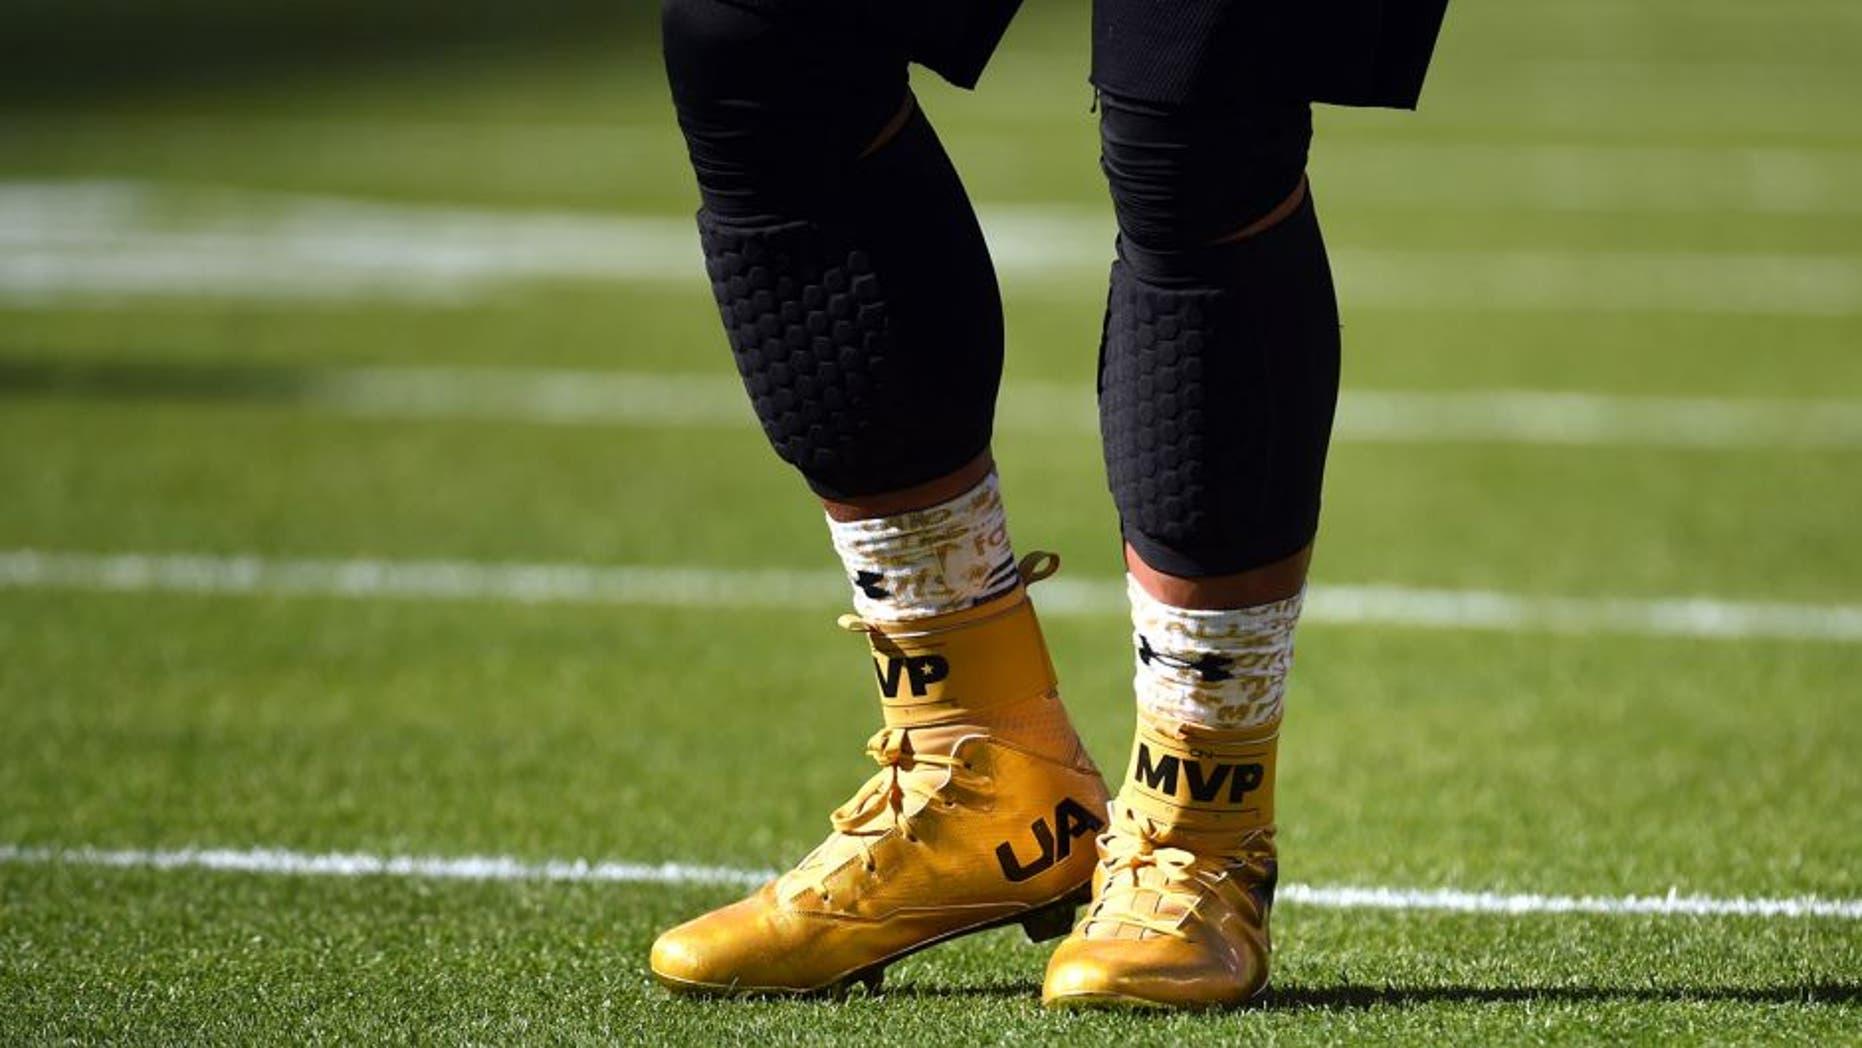 Feb 7, 2016; Santa Clara, CA, USA; Detail view of the shoes of Carolina Panthers quarterback Cam Newton prior to Super Bowl 50 against the Denver Broncos at Levi's Stadium. Mandatory Credit: Robert Deutsch-USA TODAY Sports